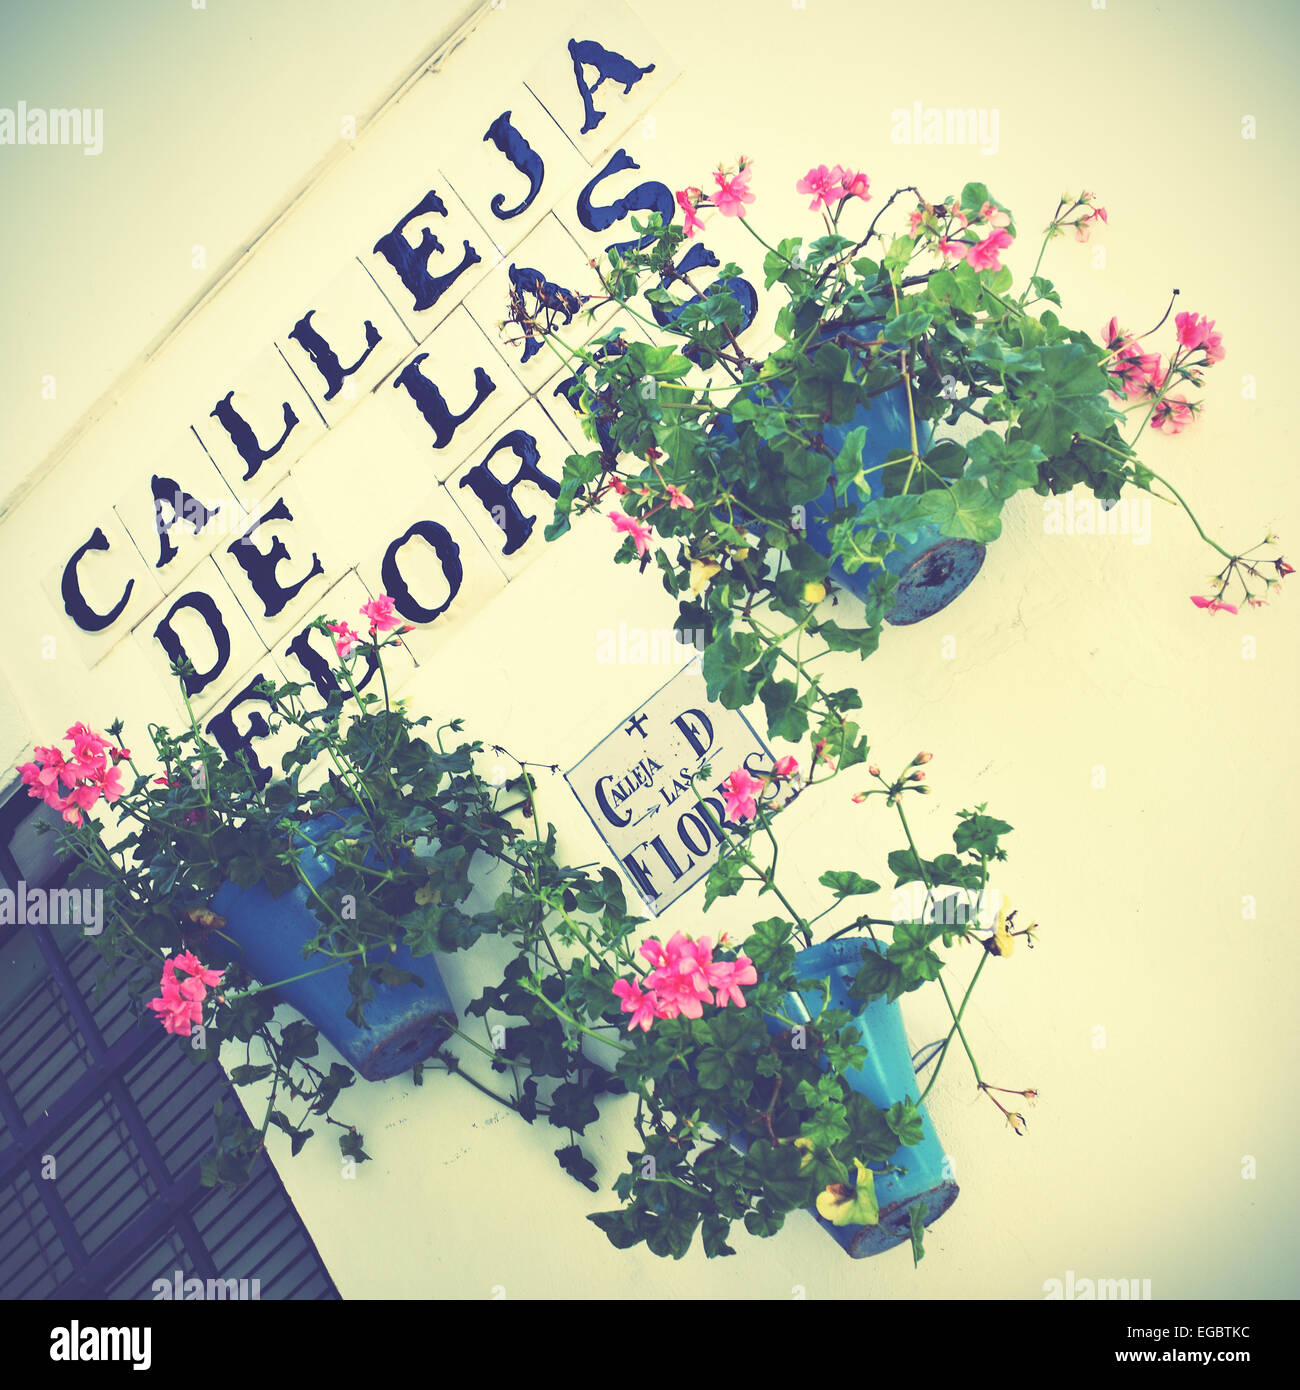 Lane of flowers (Calleja de las flores) in Cordoba, Spain. Retro style filtred image Stock Photo